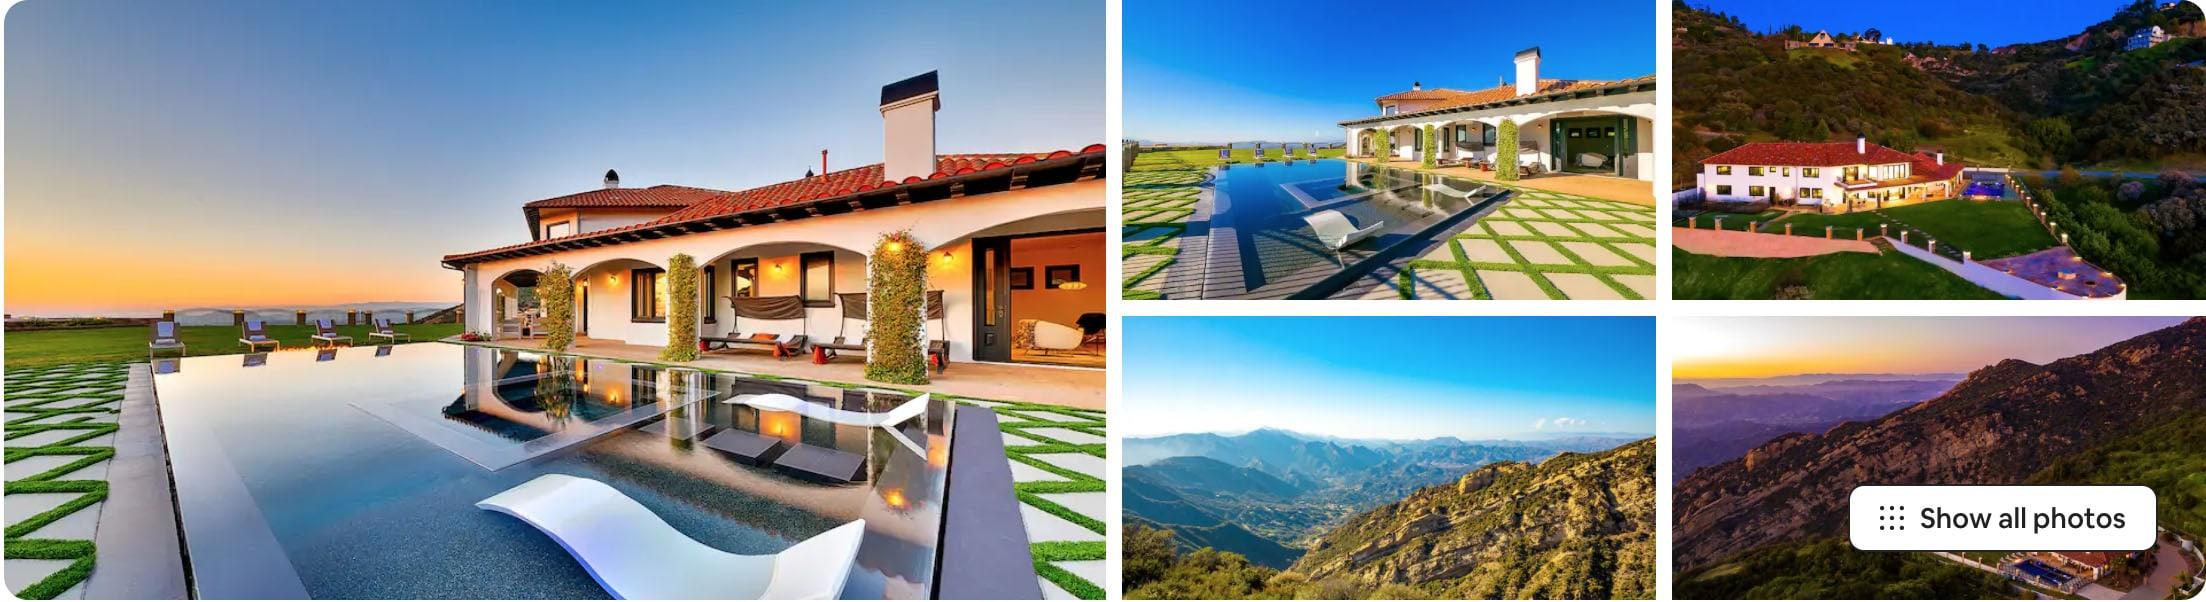 malibu garden estate - modern beach airbnb wedding venues in southern california